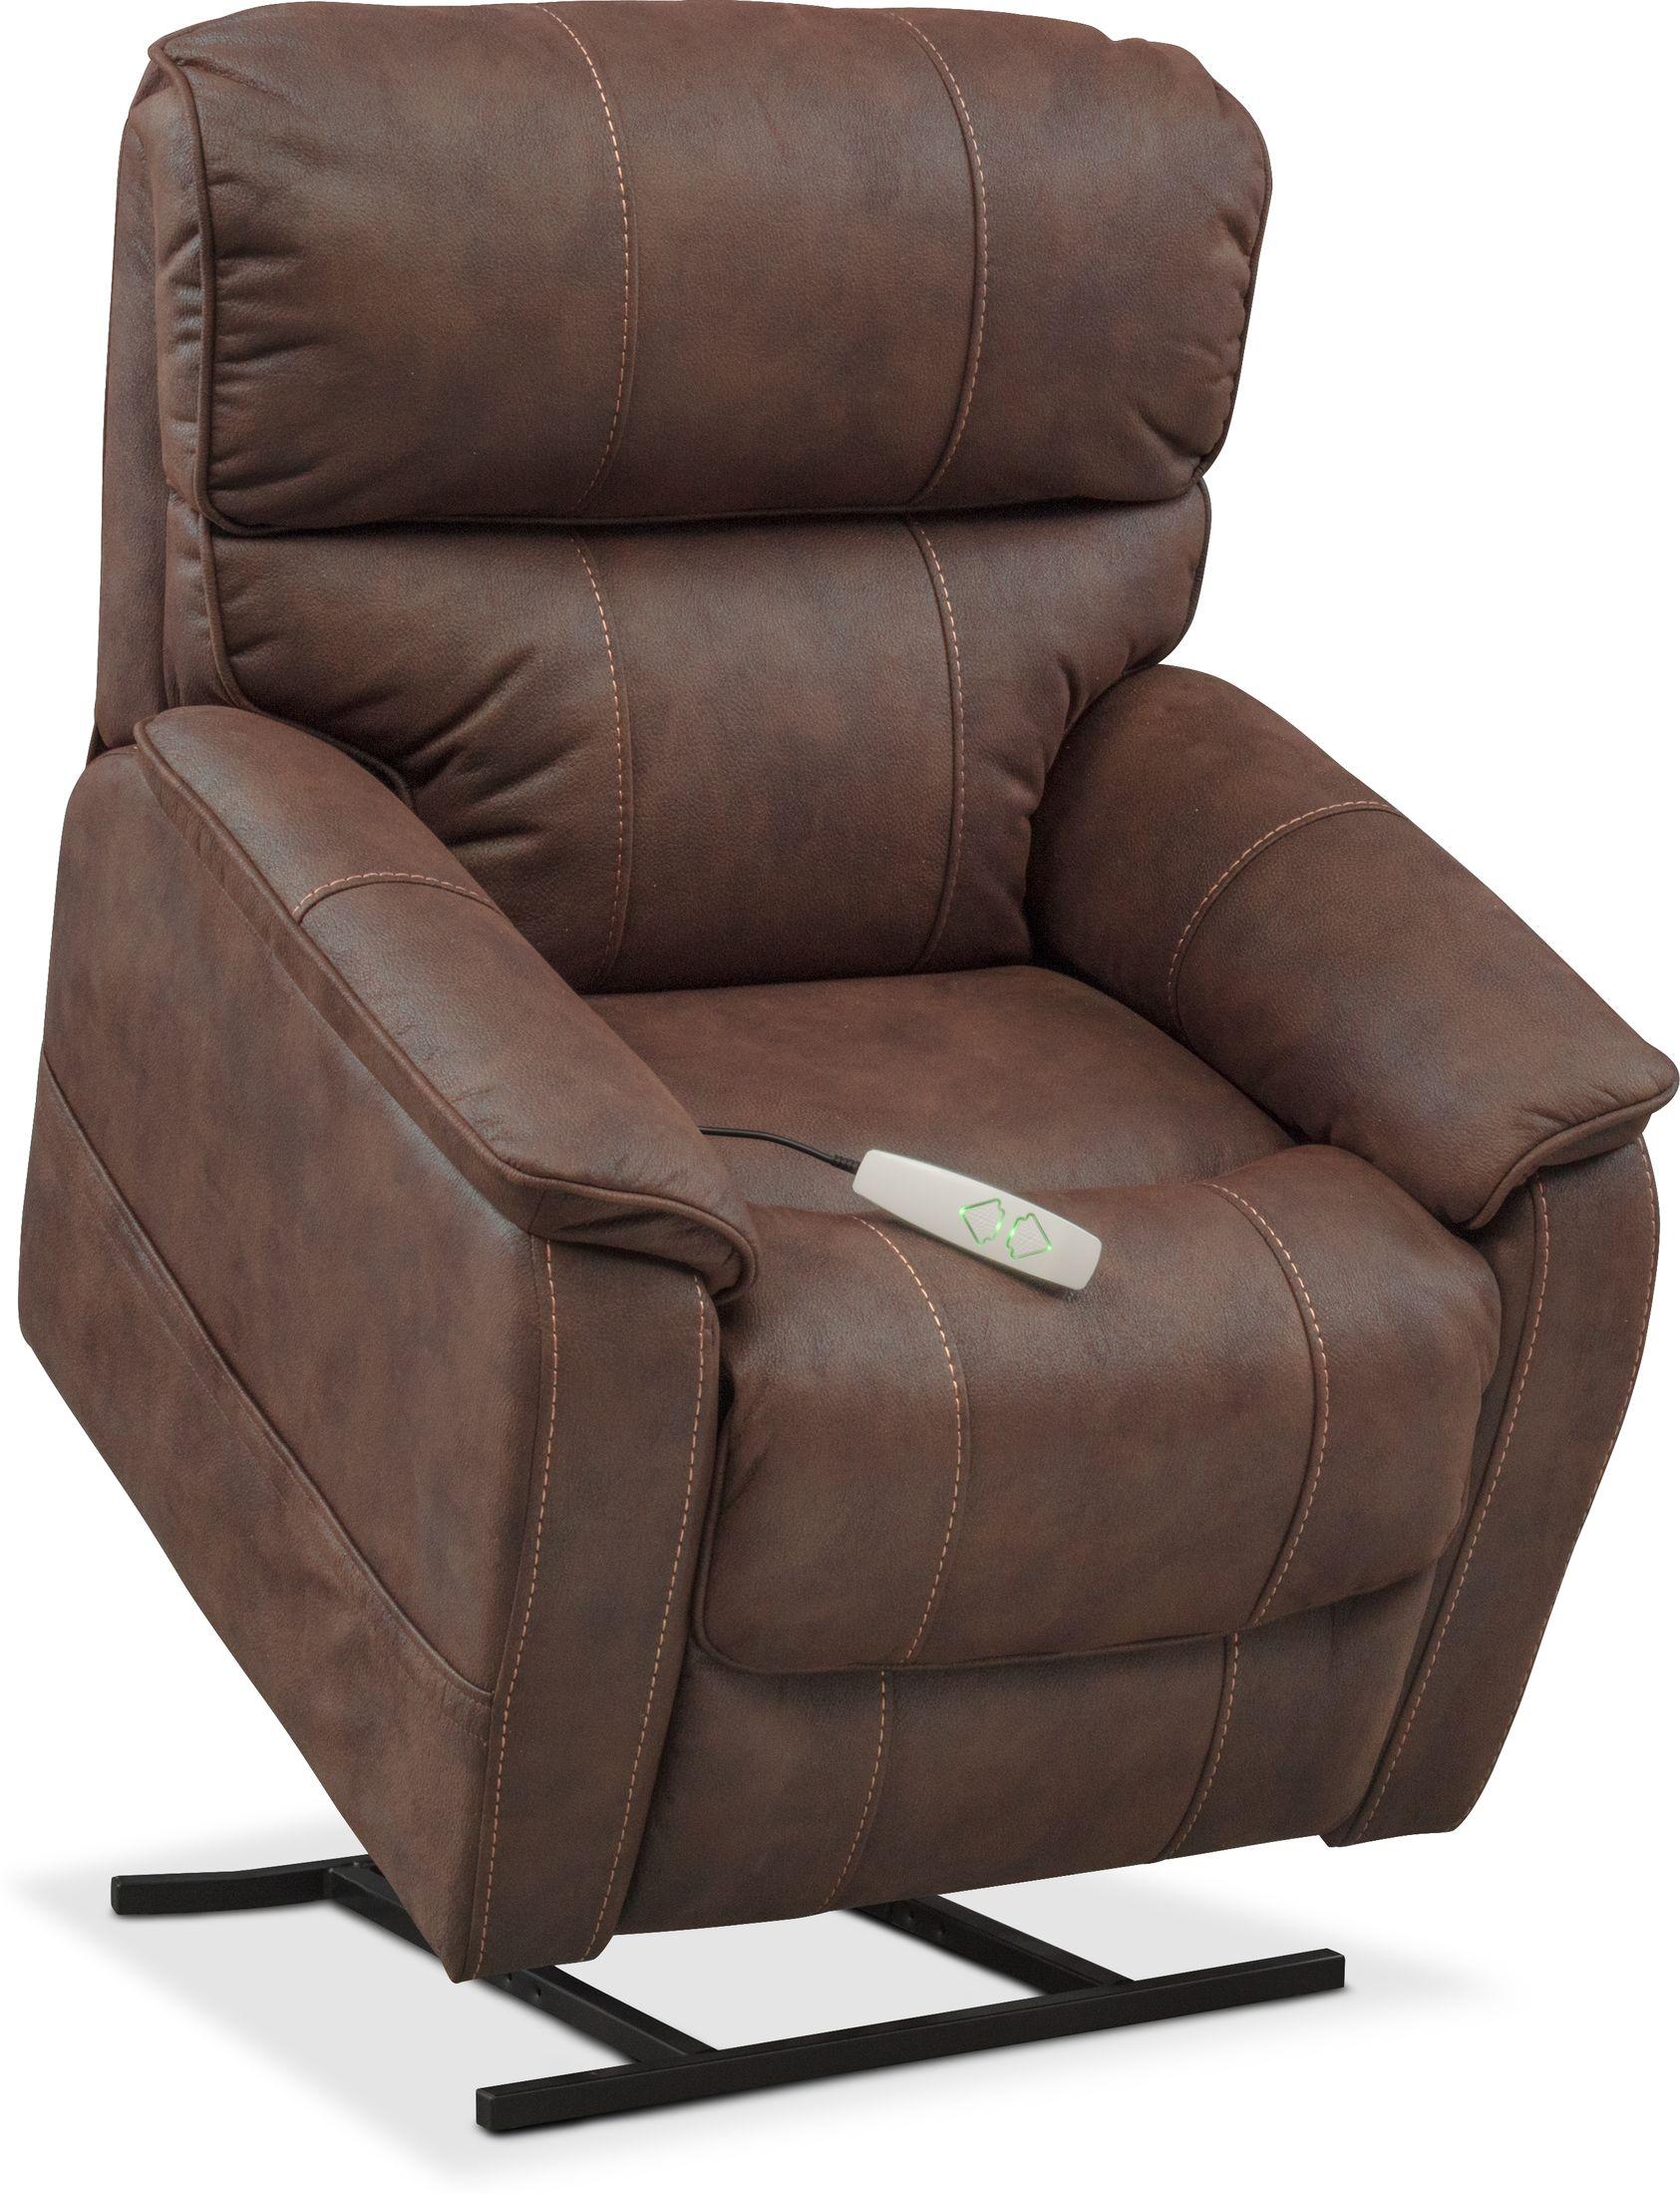 Living Room Furniture - Mondo Power Lift Recliner